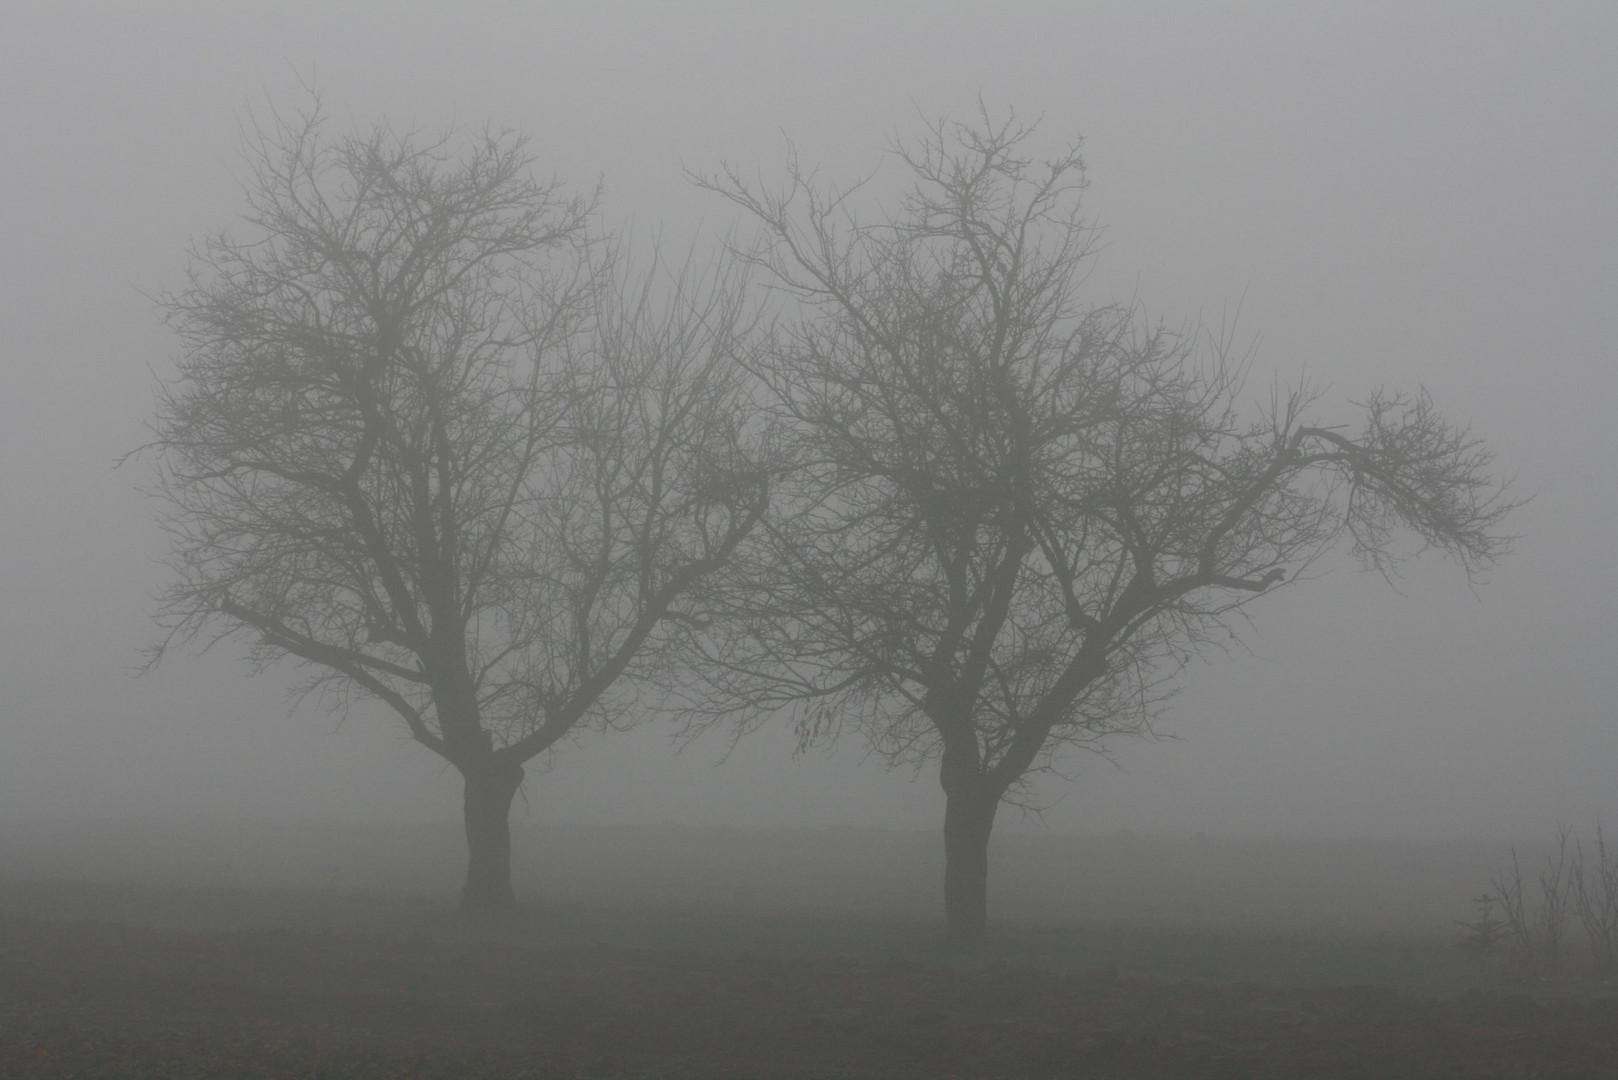 Zwillinge im Nebel